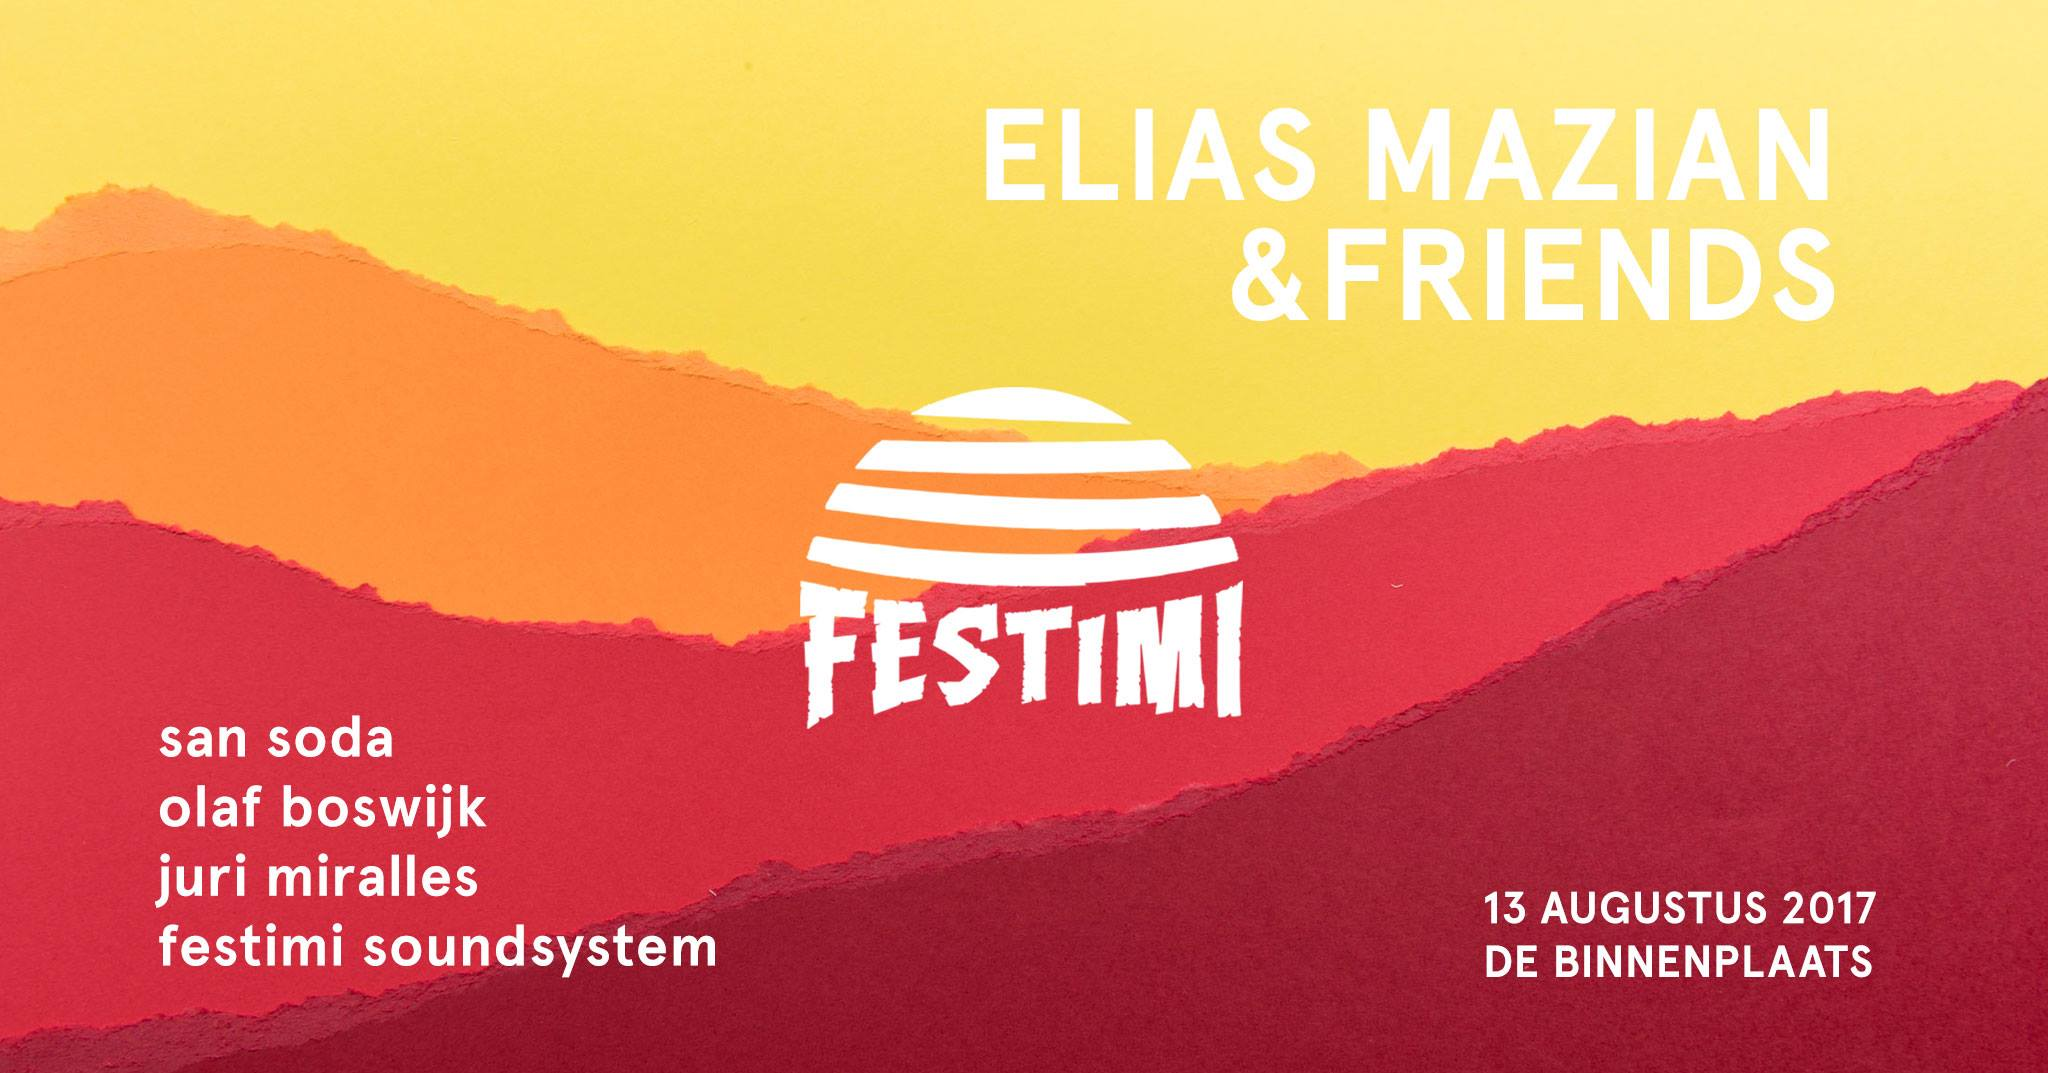 Festimi | Elias Mazian & Friends - 13 augustus 2017